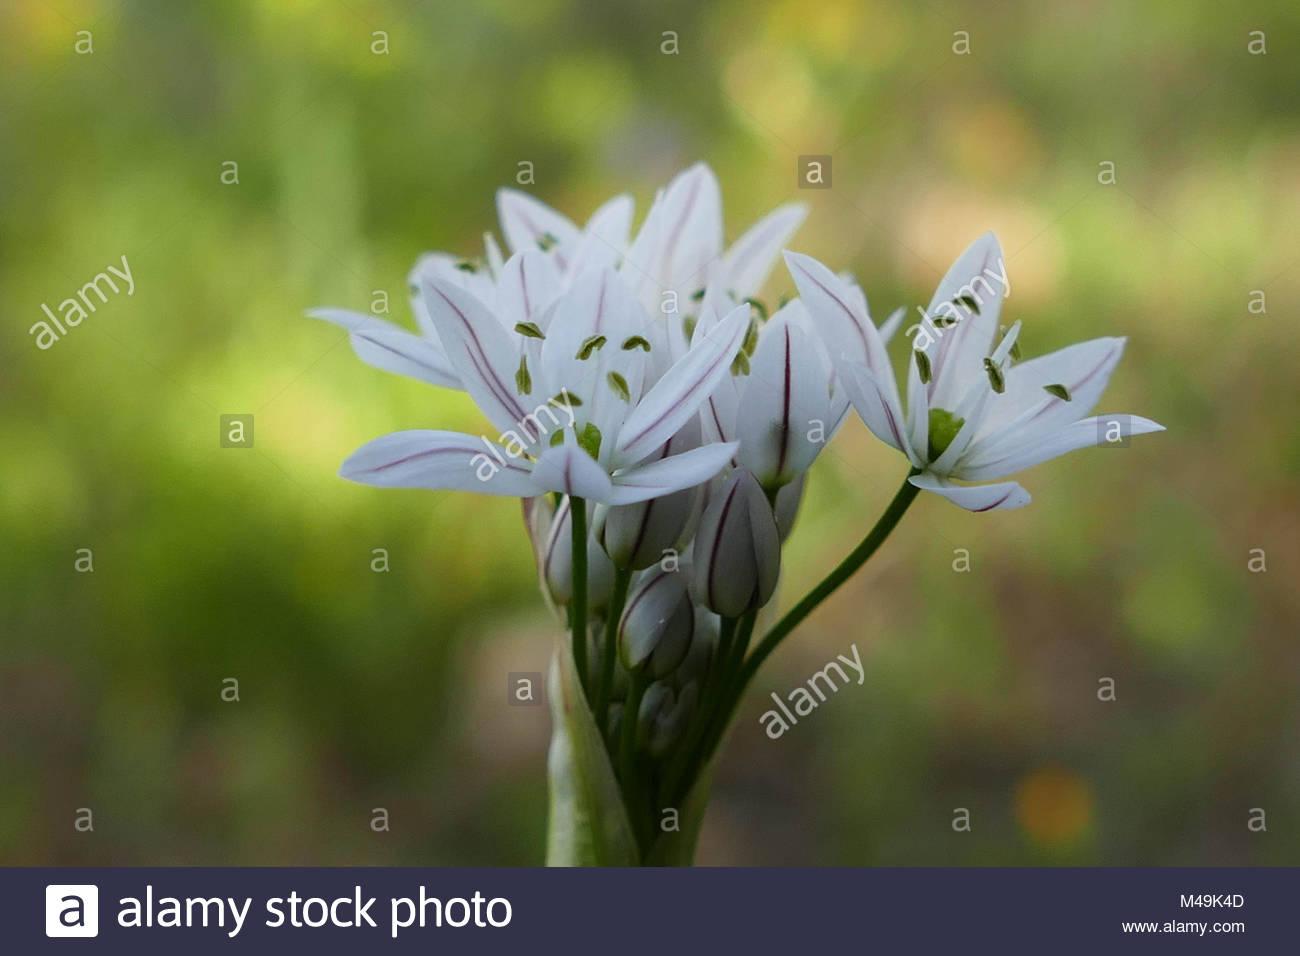 Big White Flowers Stock Photos Big White Flowers Stock Images Alamy